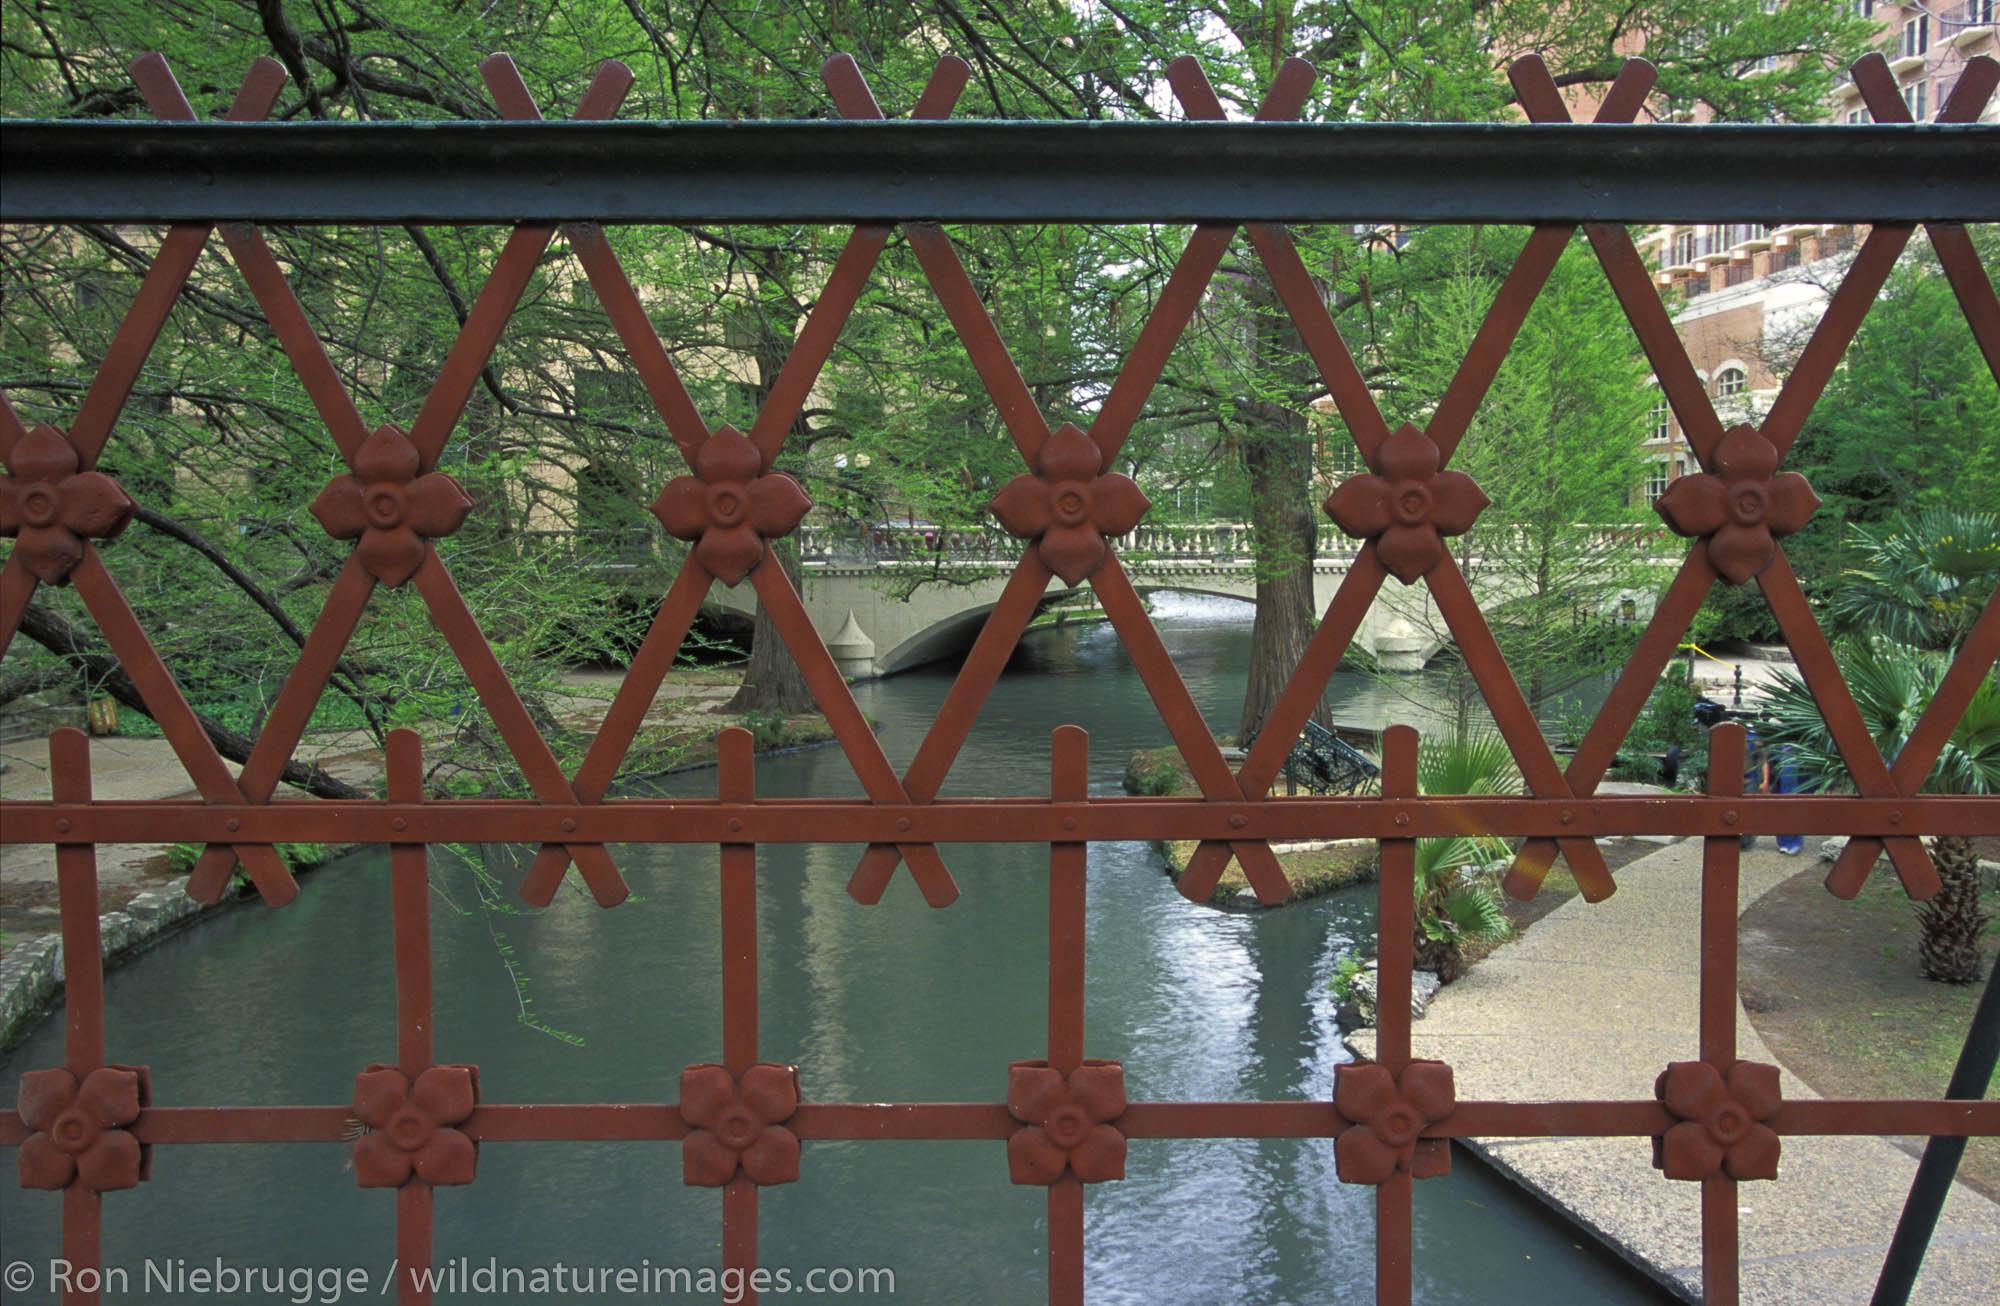 A Iron Bridge over the Riverwalk, San Antonio, Texas.